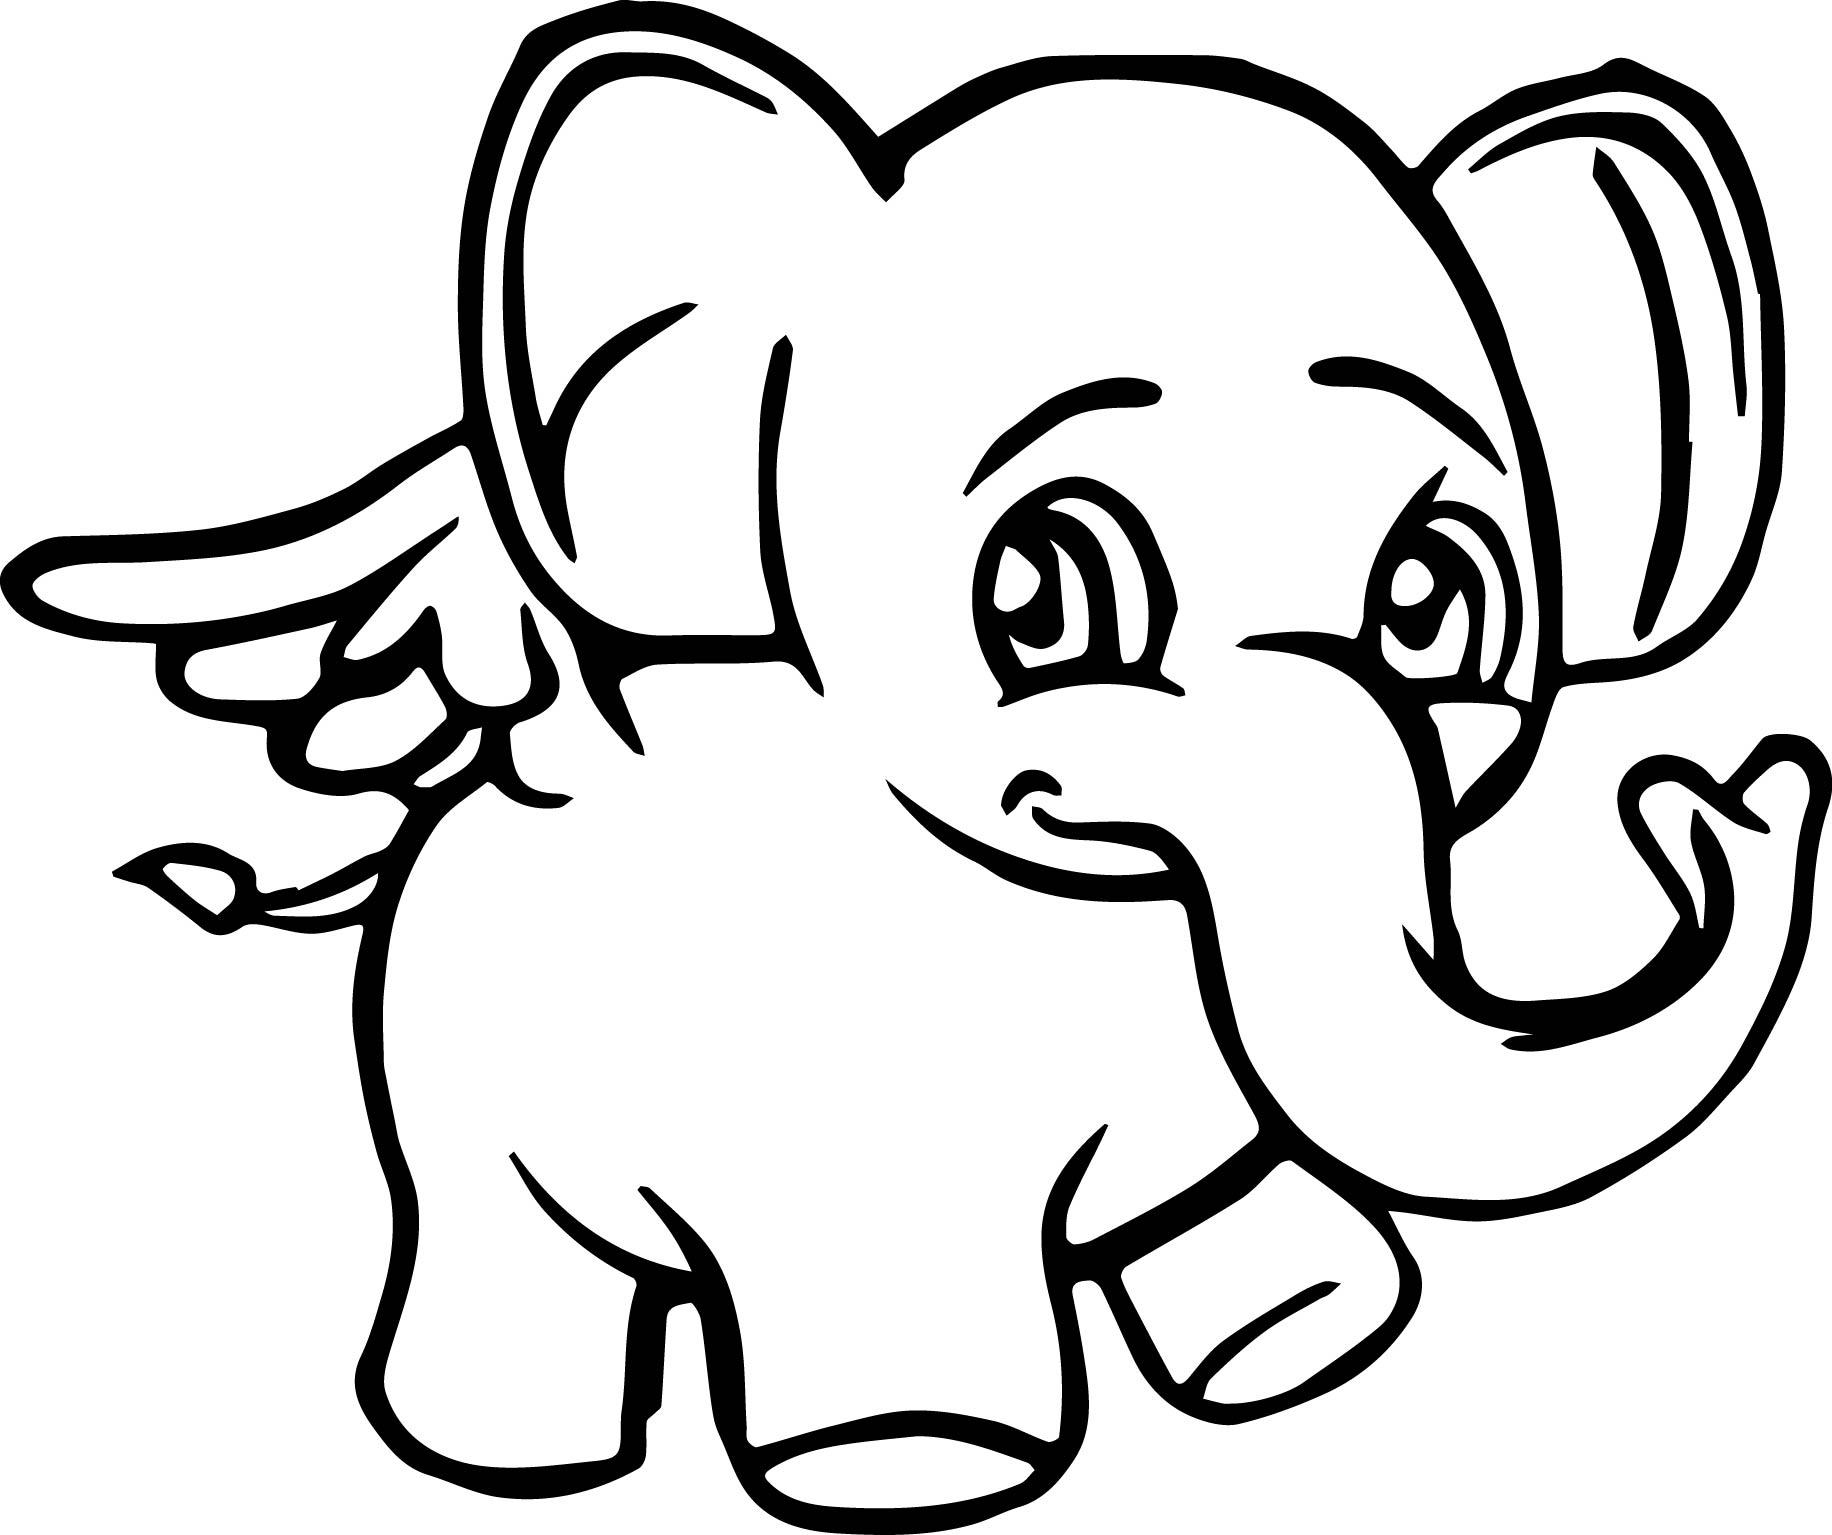 1832x1535 Unique Cartoon Elephant Coloring Pages Design Printable Coloring